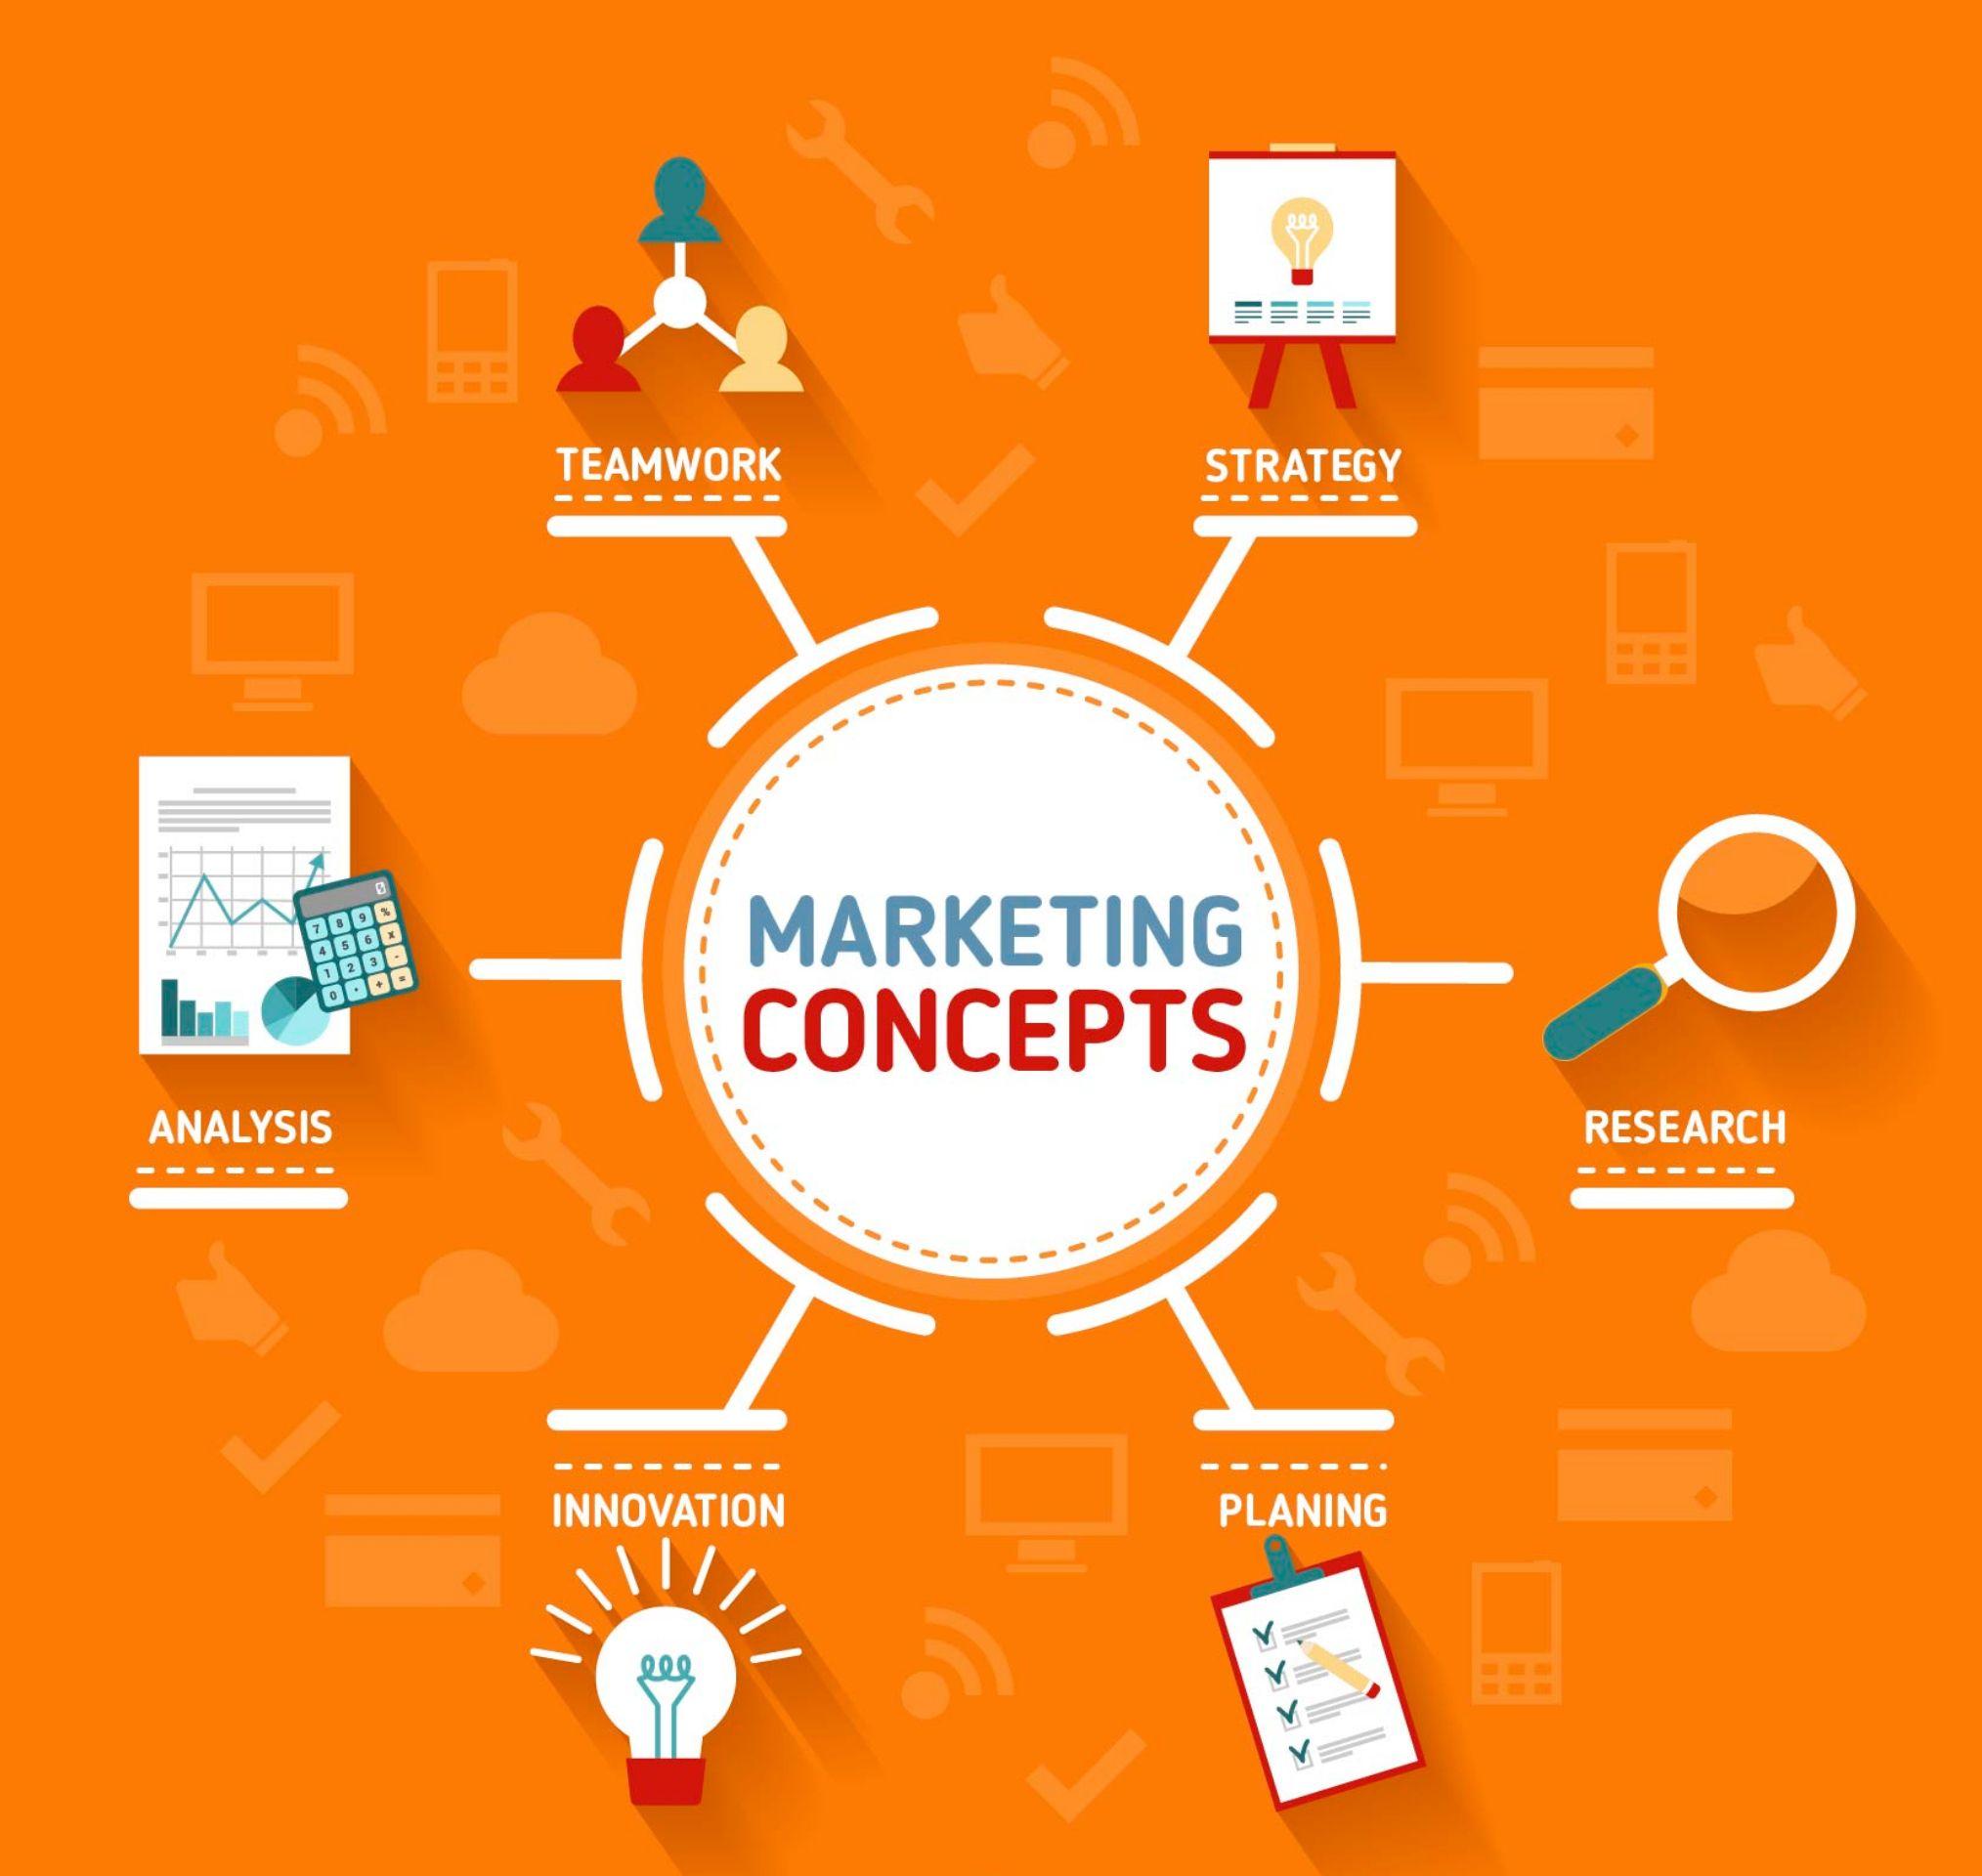 Top 4 Marketing Concepts